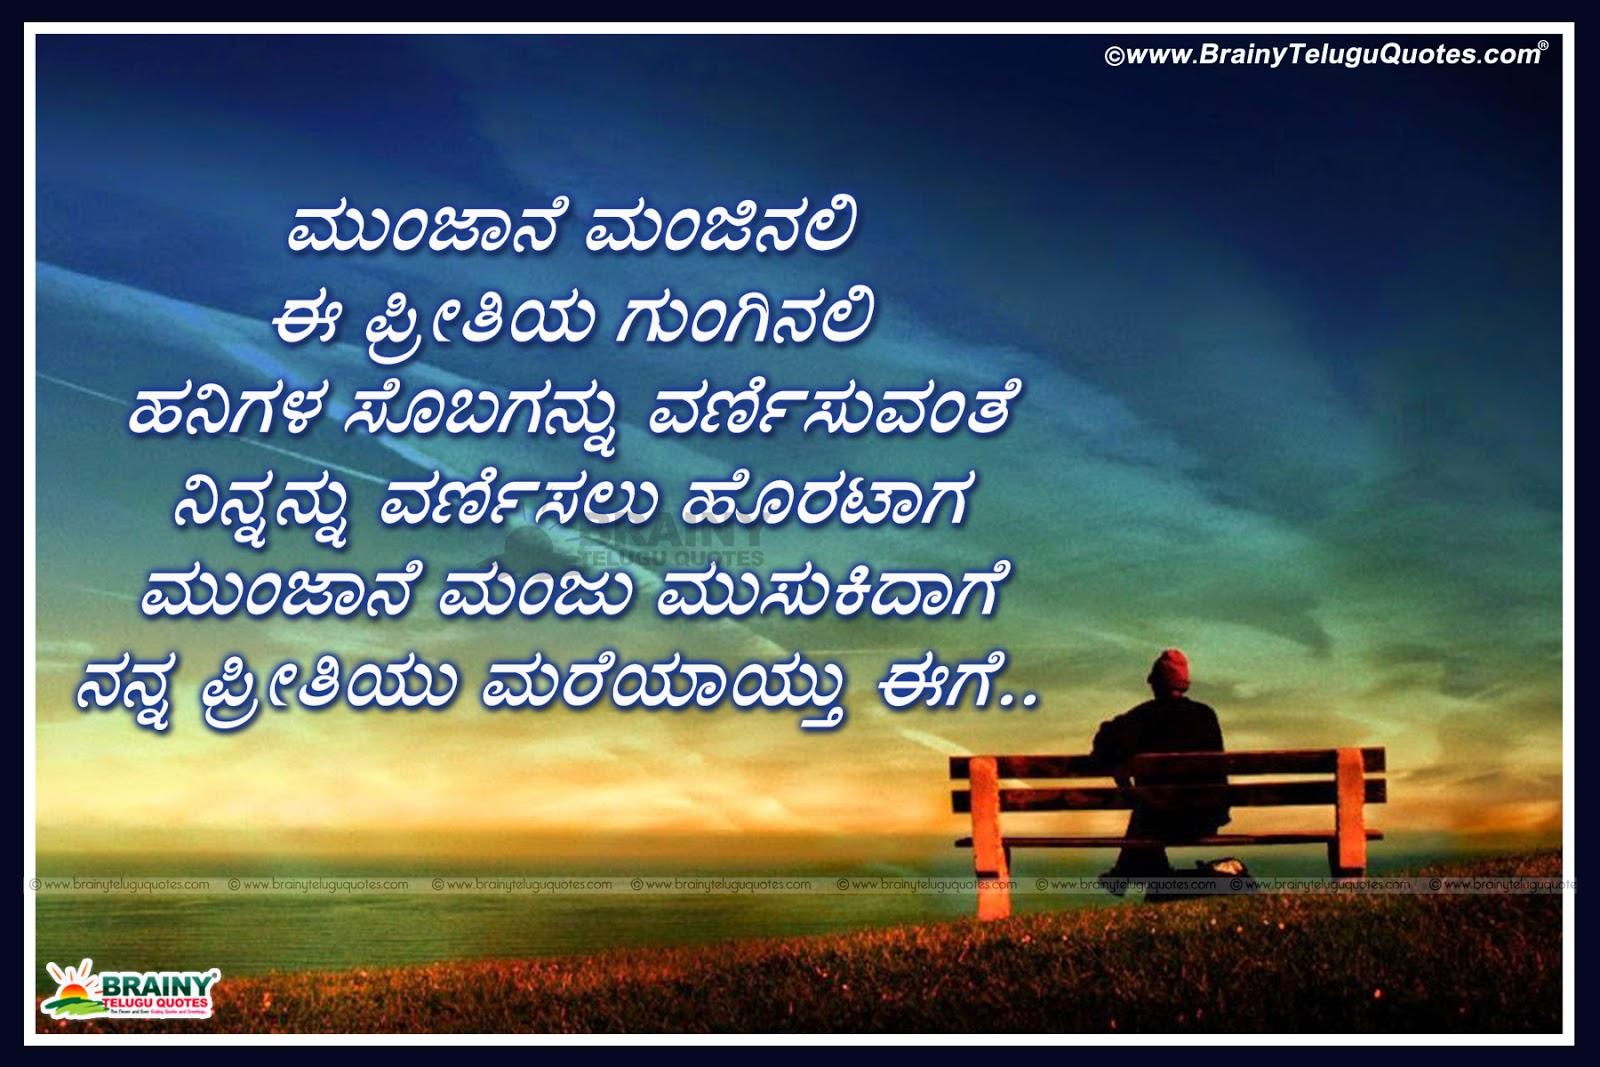 alone love failure quotes kavanagalu in kannada language